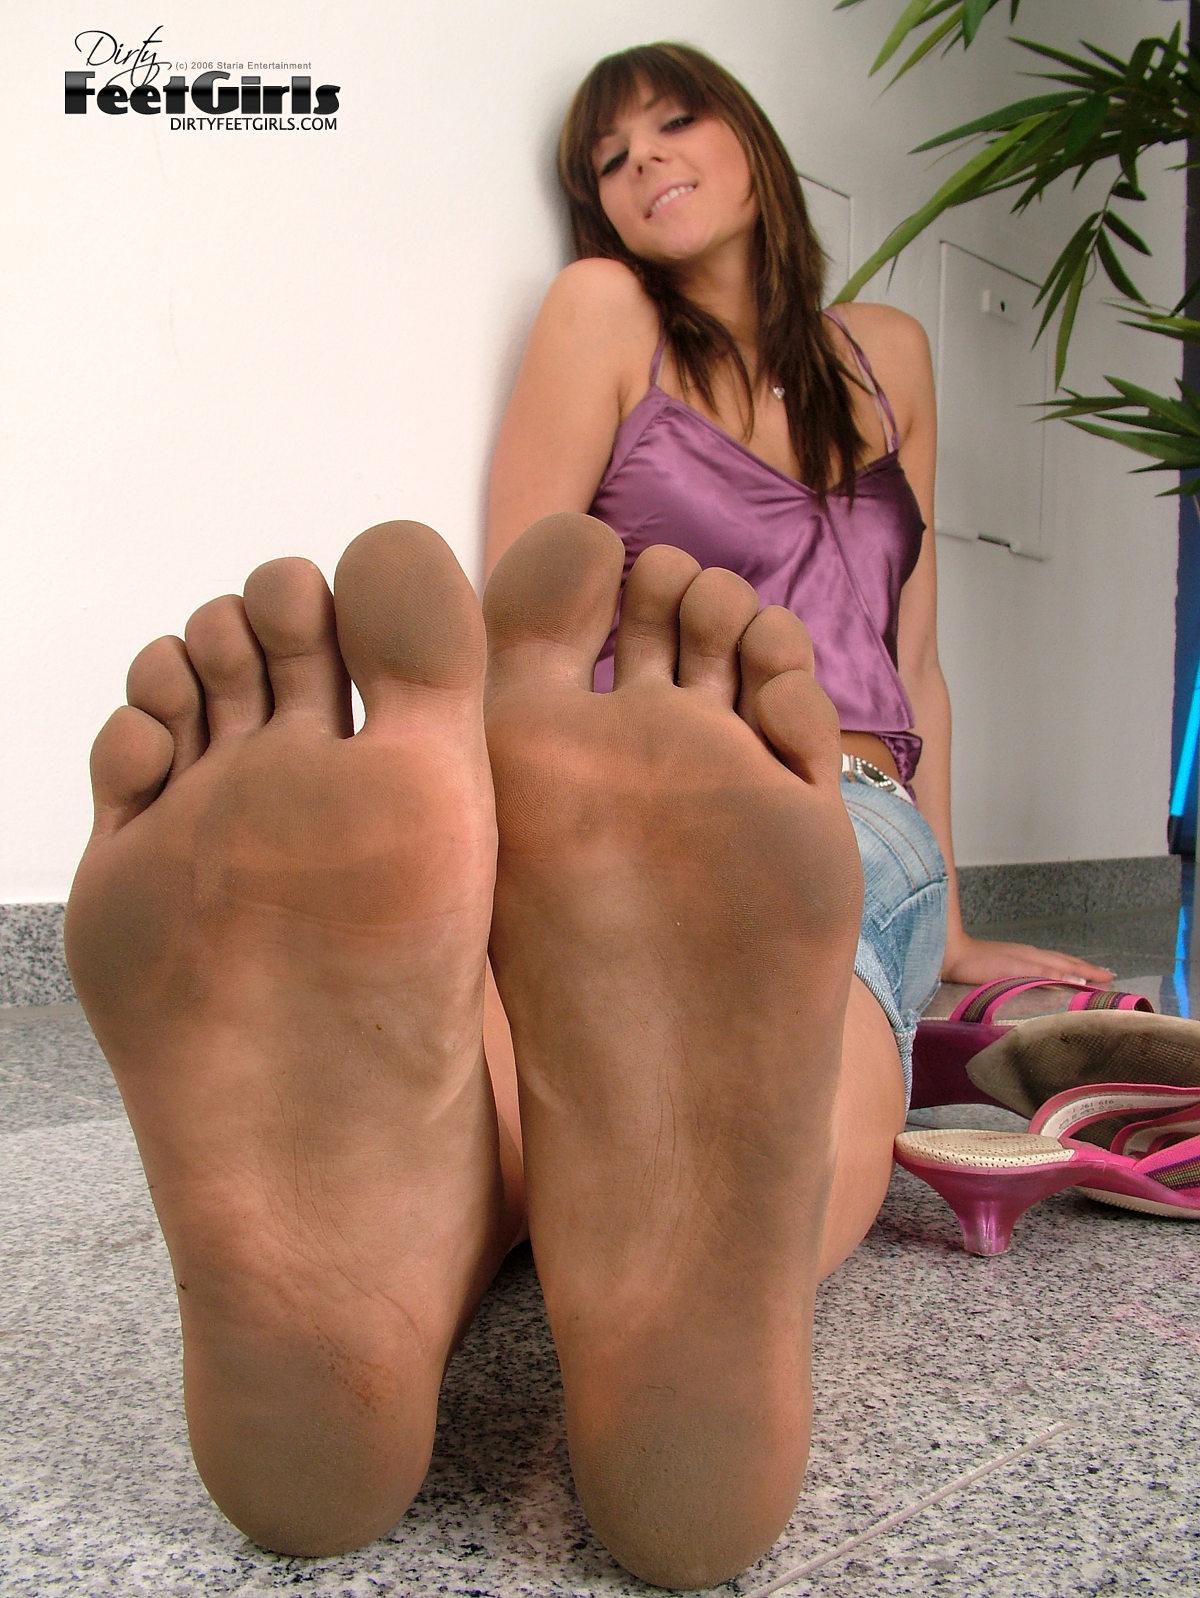 Feet dusty 5590 fetish foot